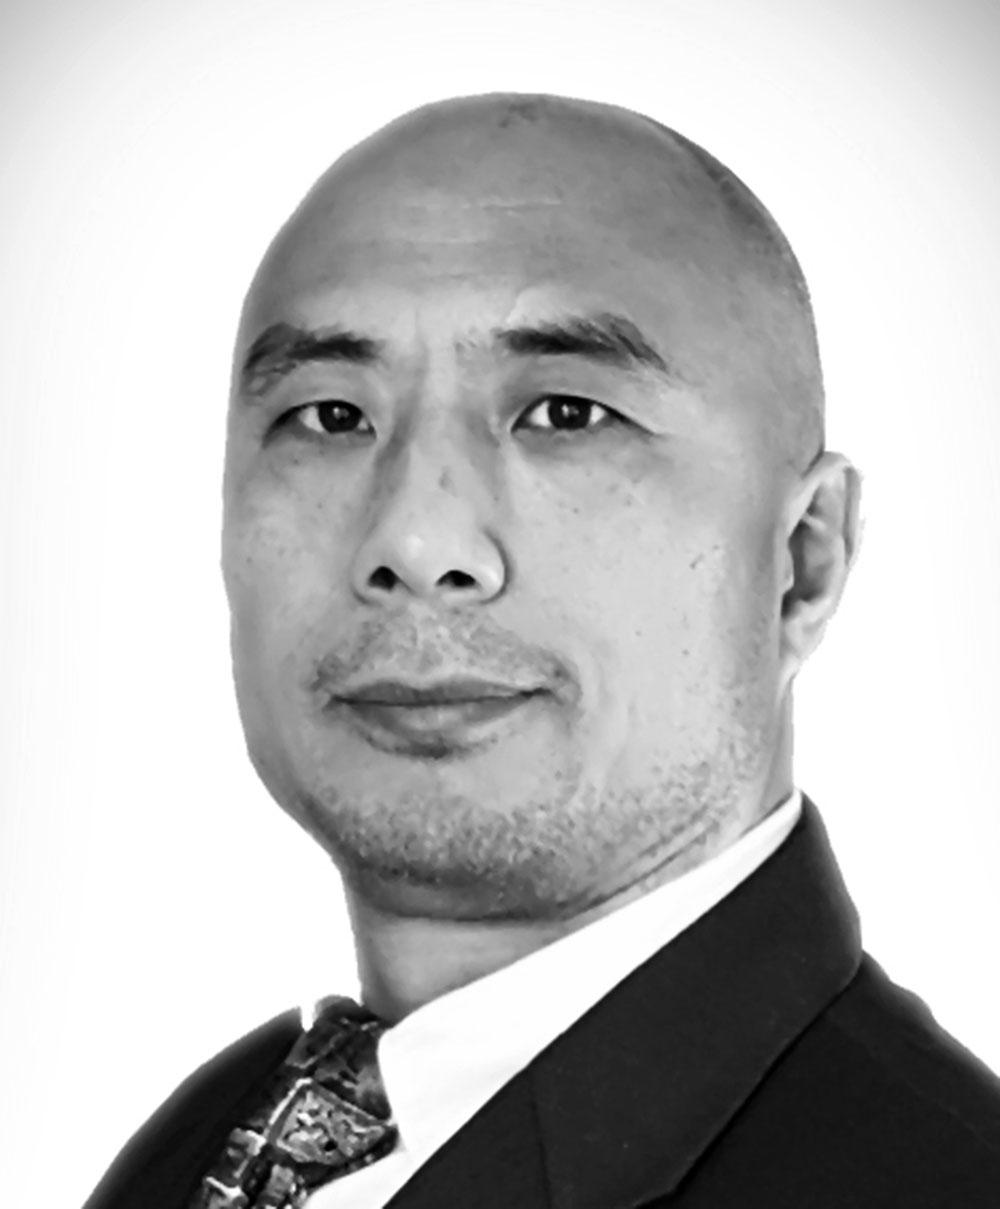 Headshot of Bruce Han